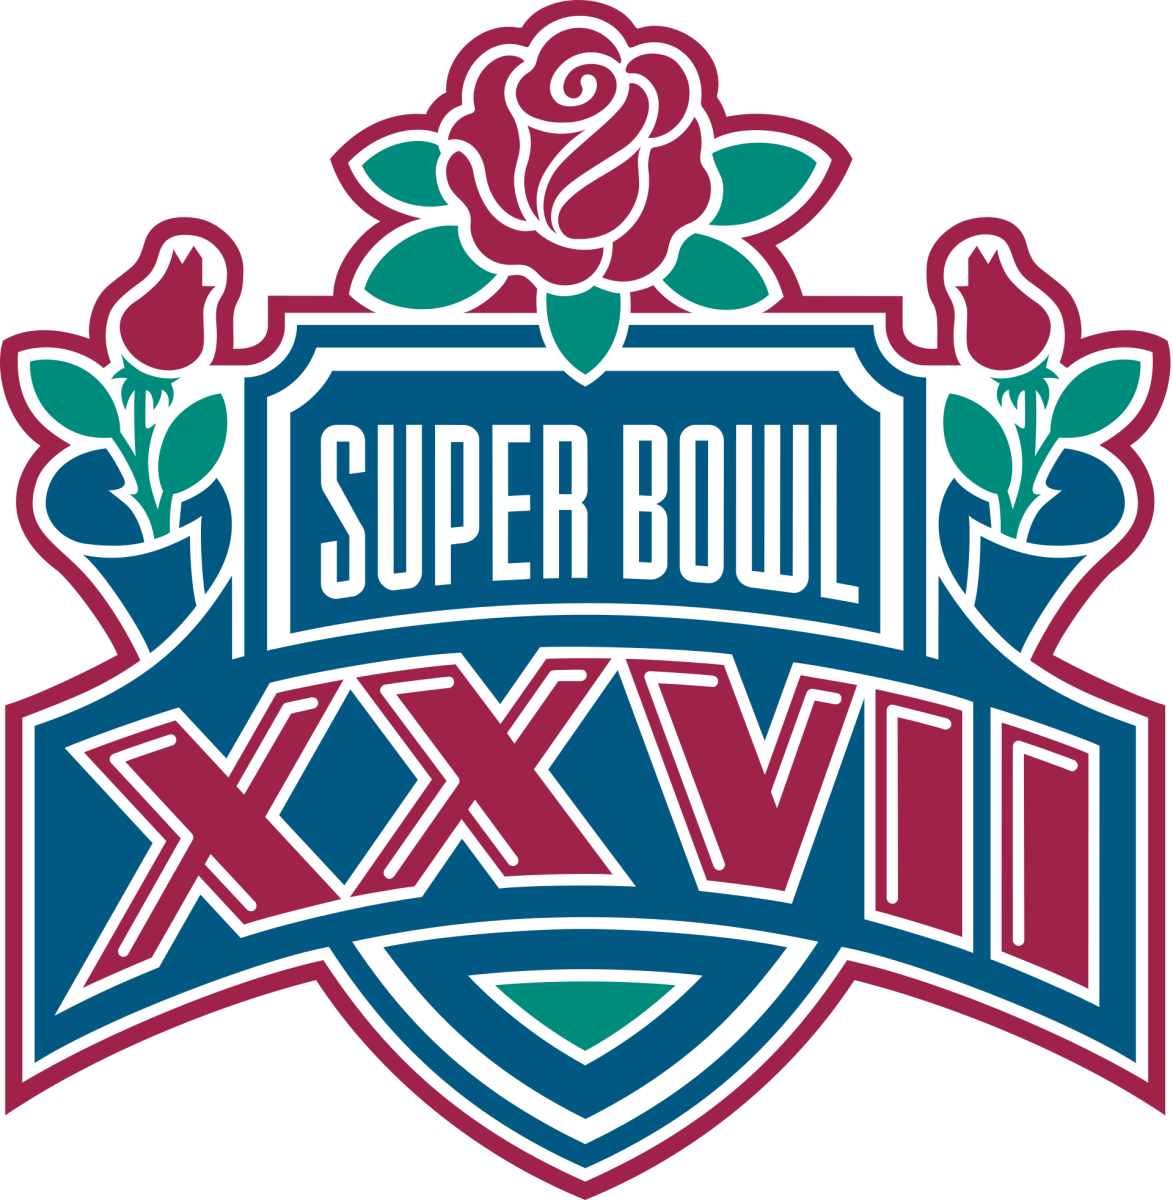 Super_Bowl_XXVII_Logo.svg